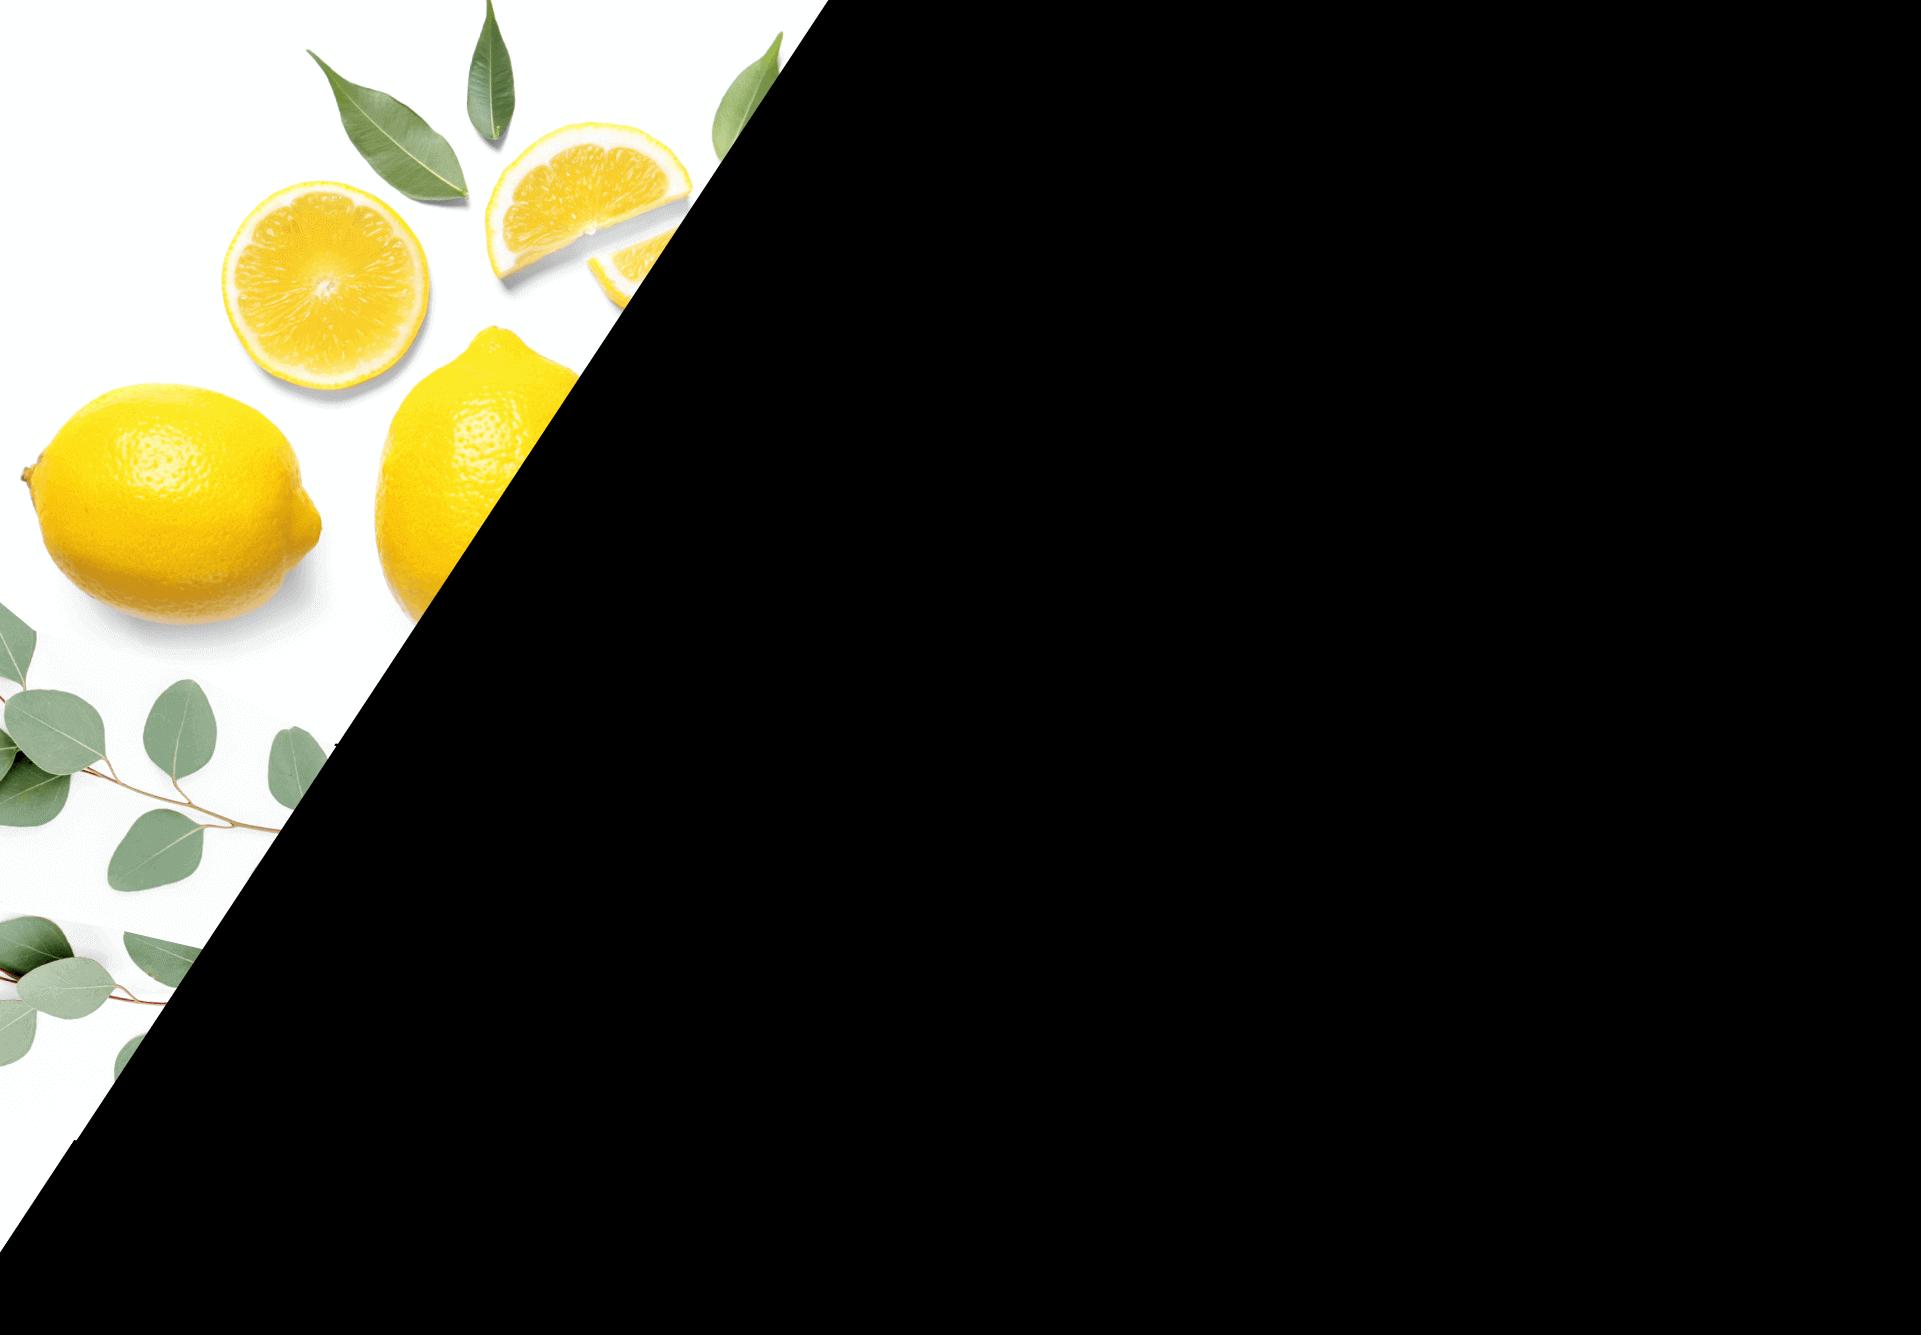 Eucalyptus and lemon